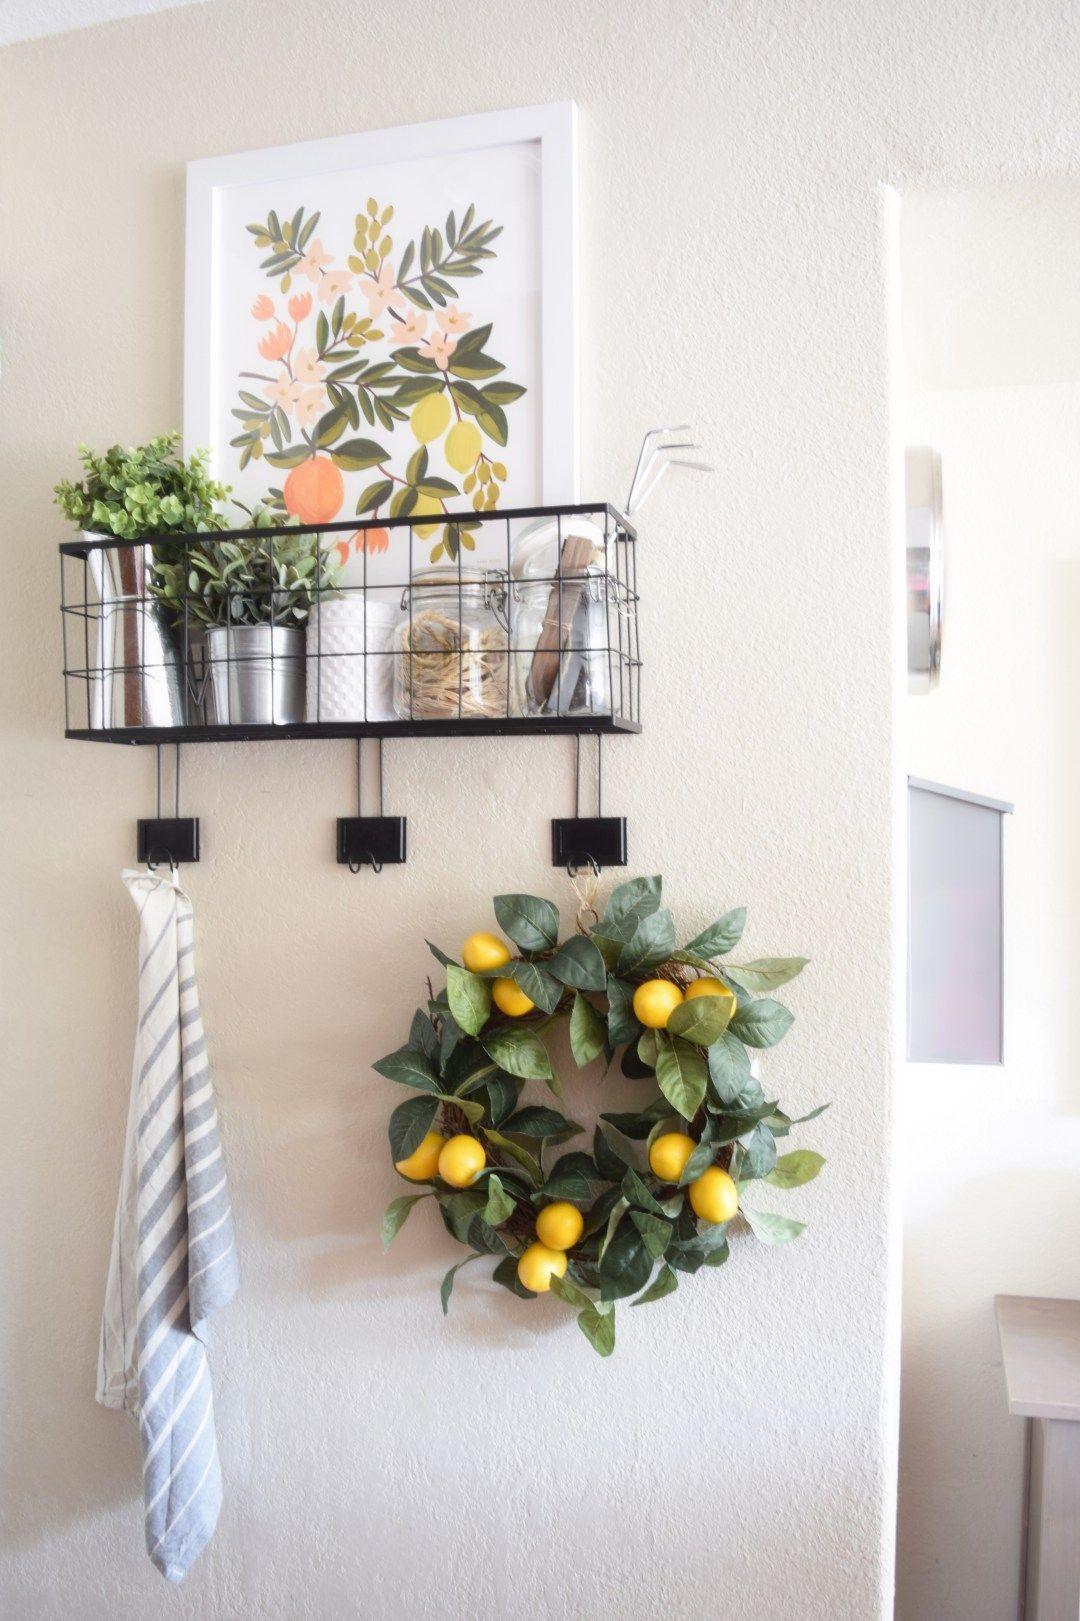 Sensational Lovely Kitchen Wall Display With Lemon Wreath And Art Interior Design Ideas Helimdqseriescom